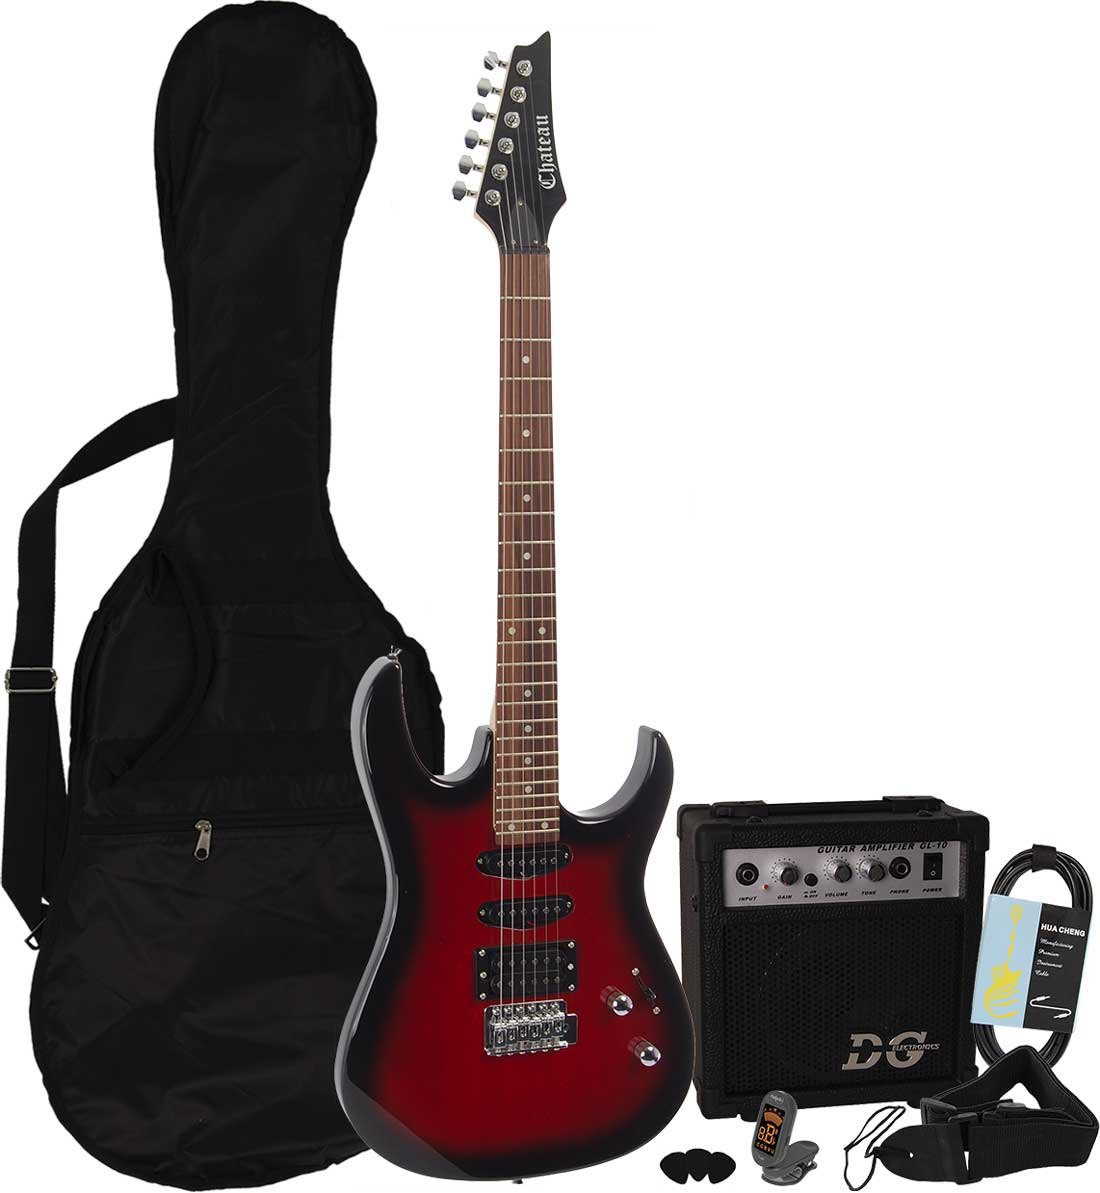 Billede af Chateau C08-IB2 el-guitar, rød, PAKKE 1